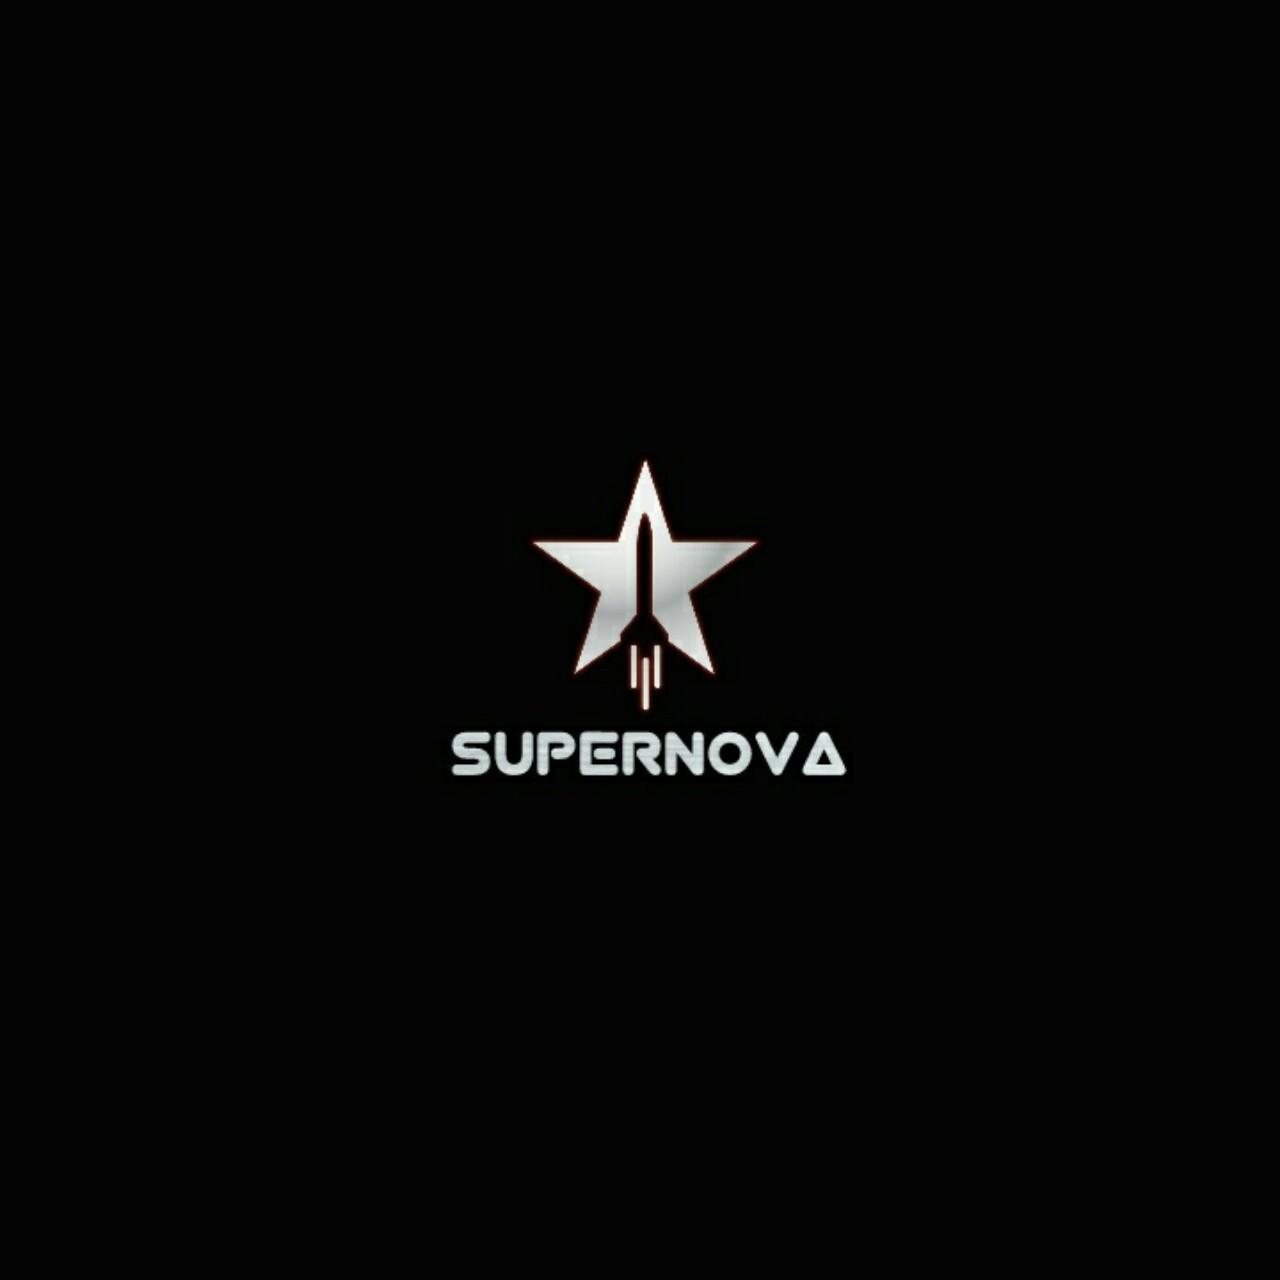 Logo Design by Gilang Satria - Entry No. 226 in the Logo Design Contest Creative Logo Design for Supernova.